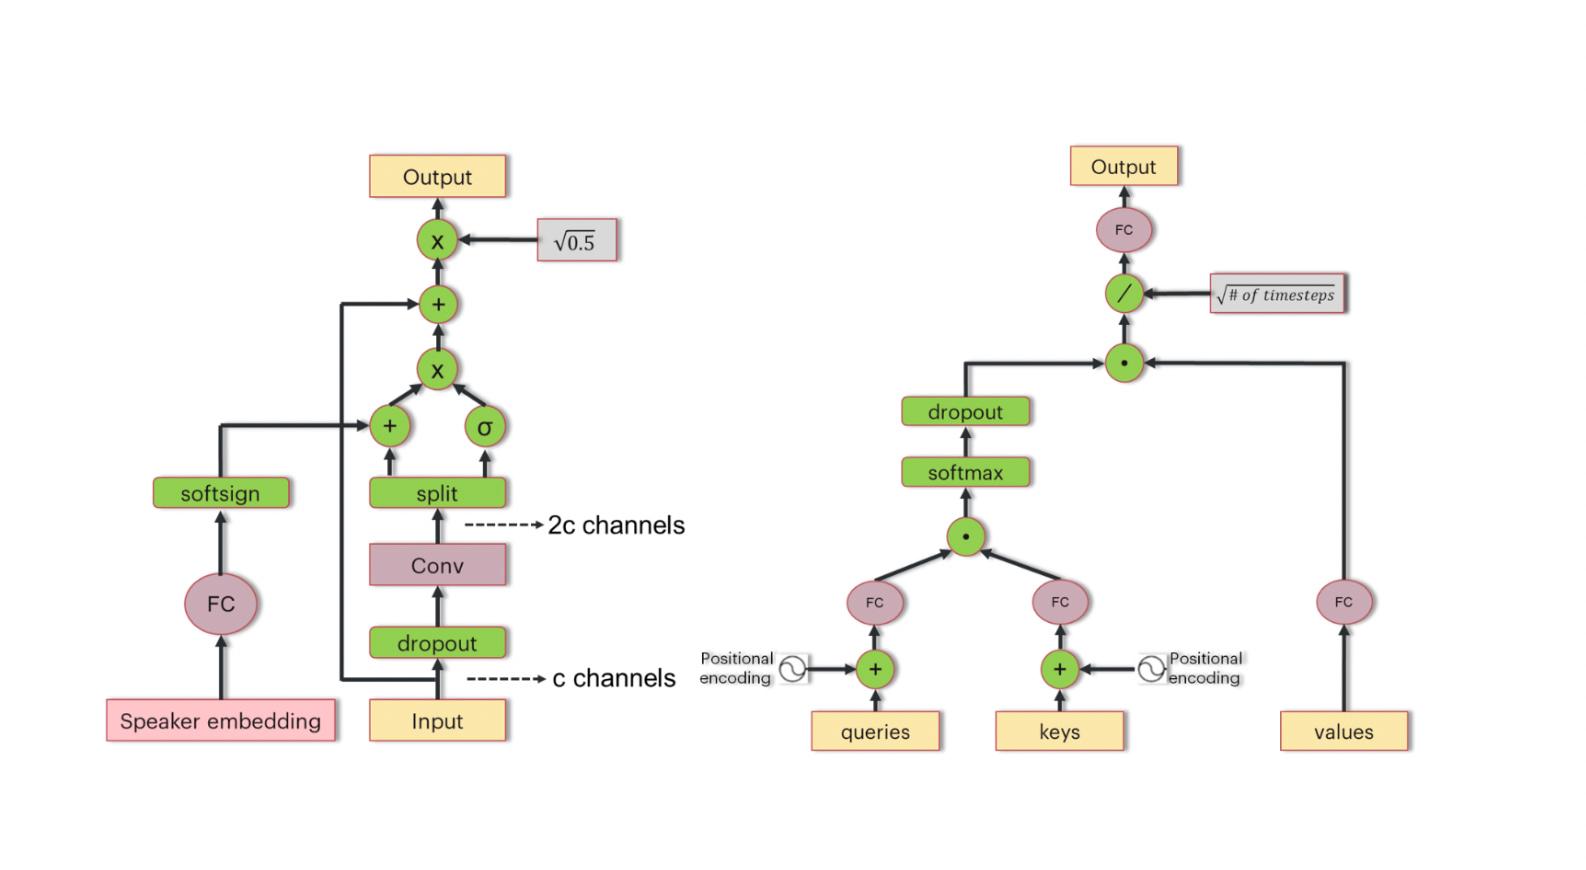 Main Building Blocks of Deep Voice 3 Model